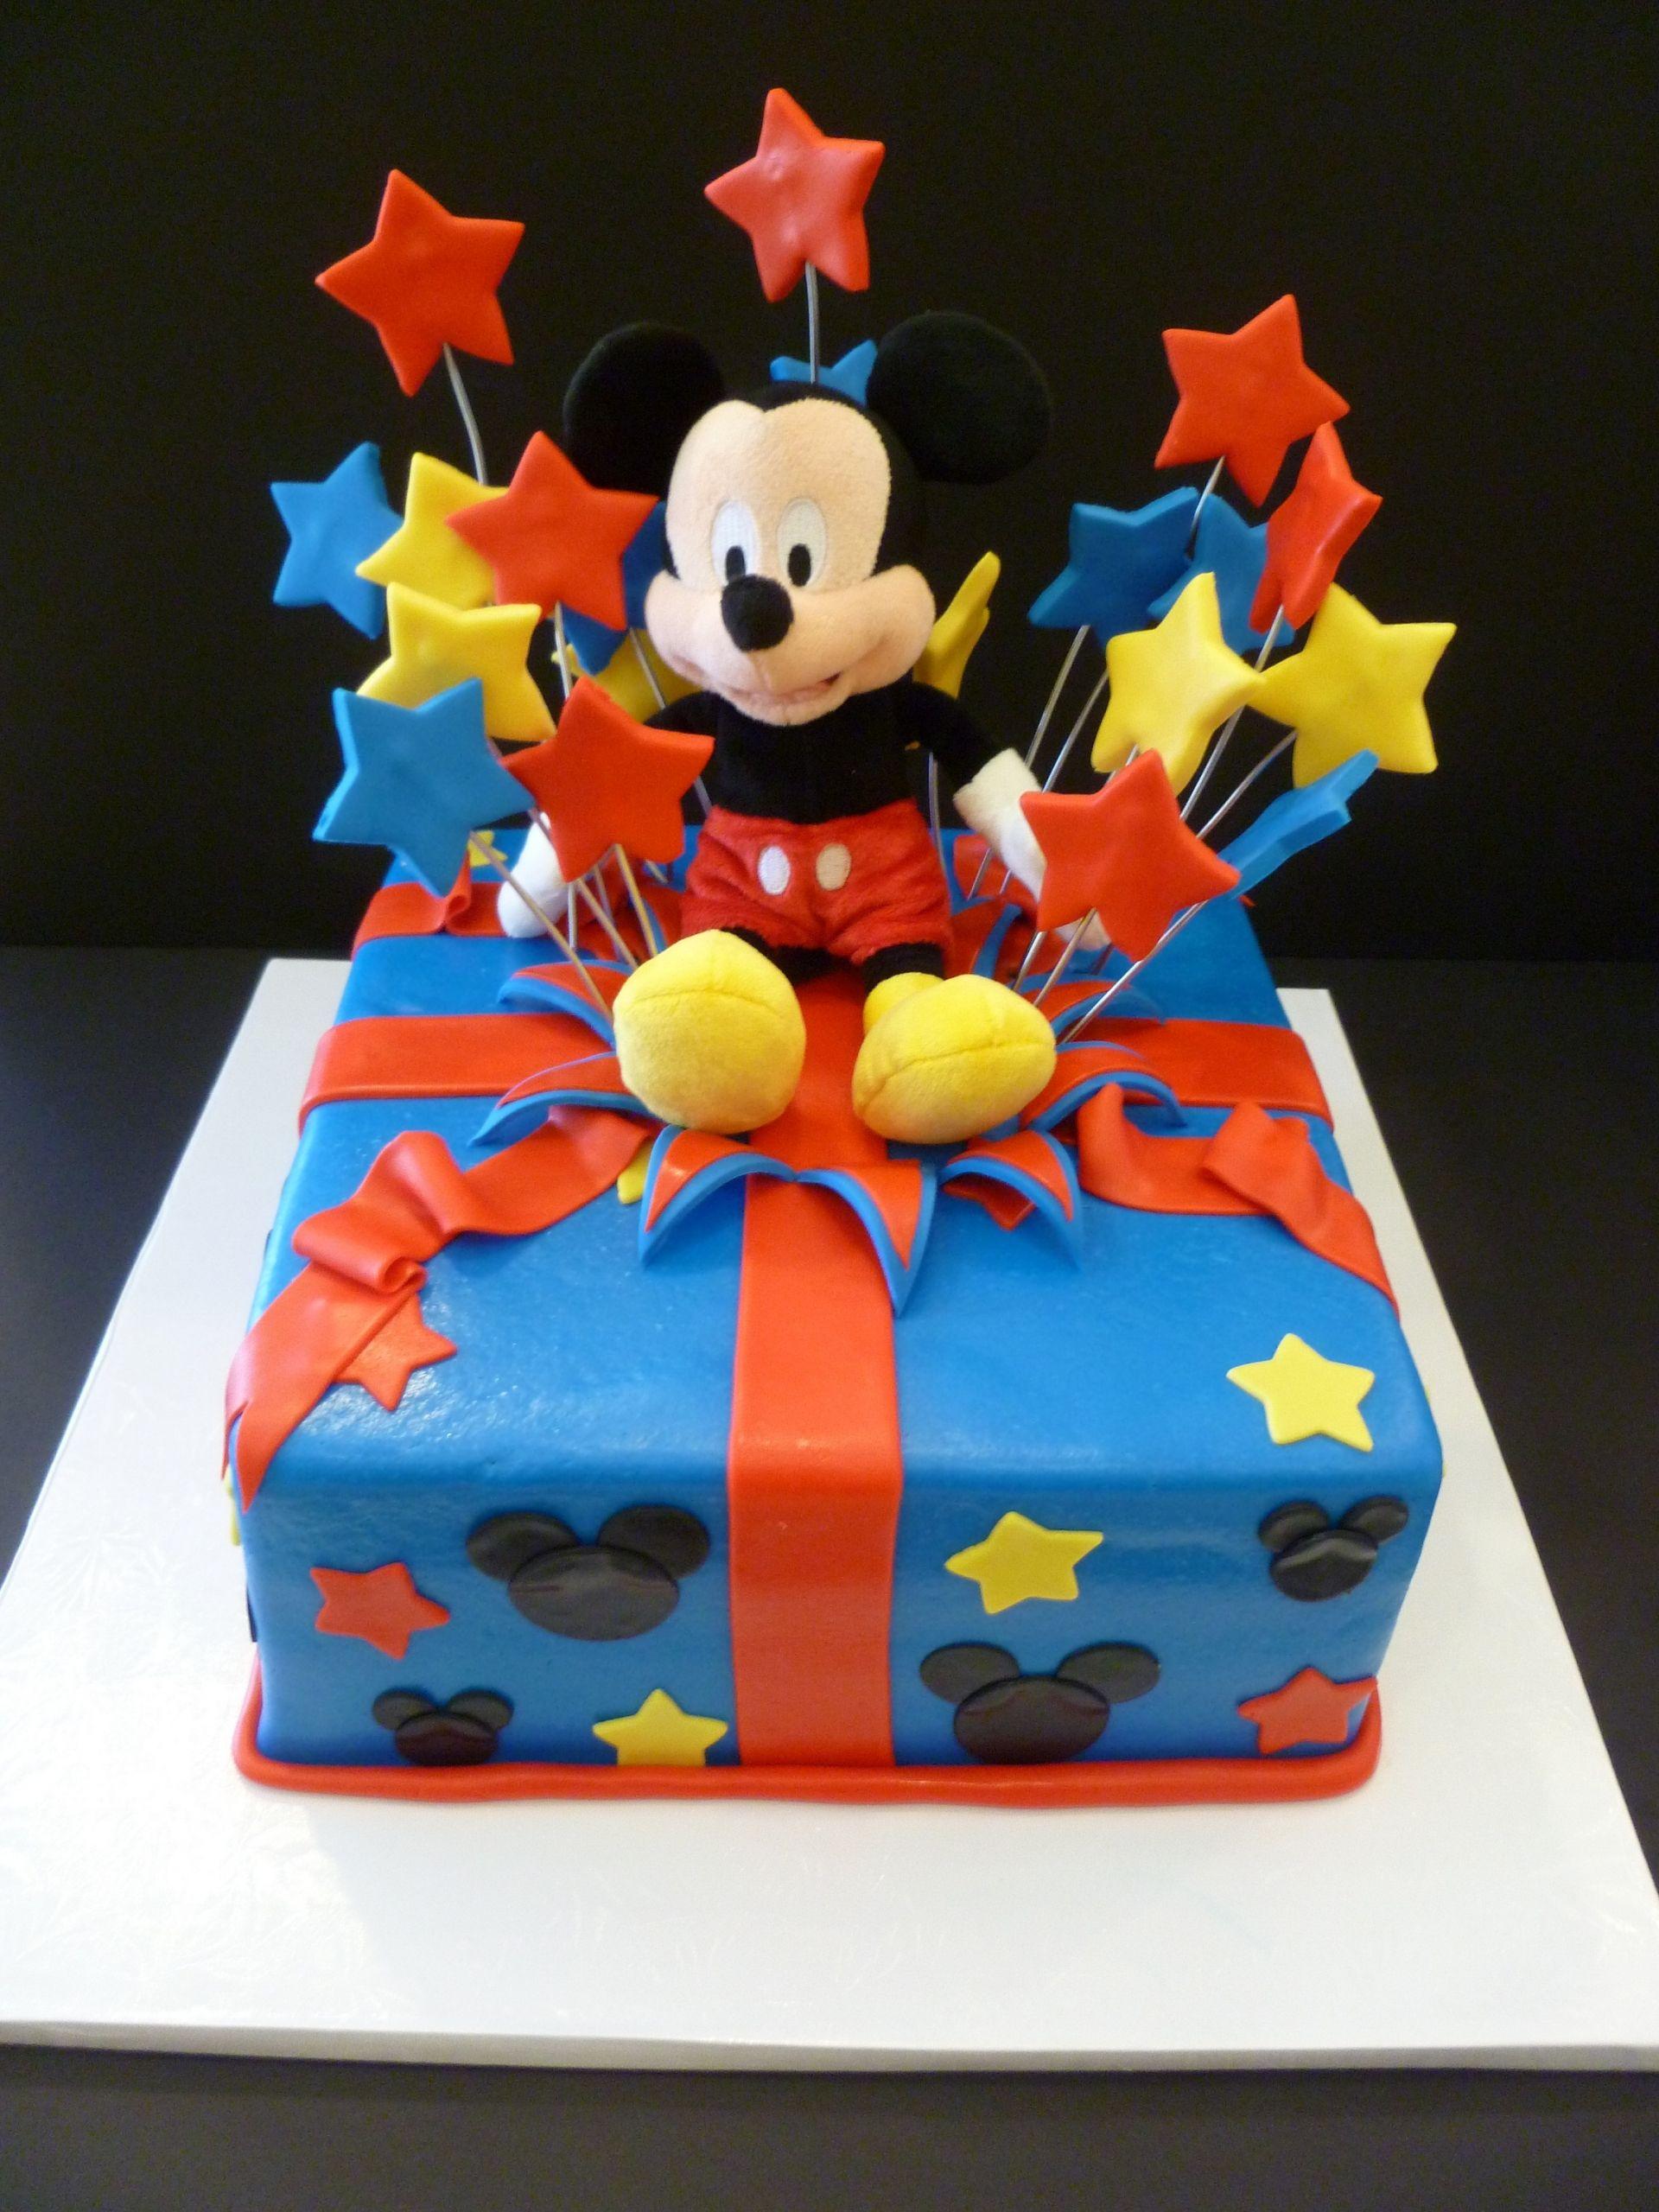 mickey mouse birthday cake ideas - Google Search | Birthdays ...